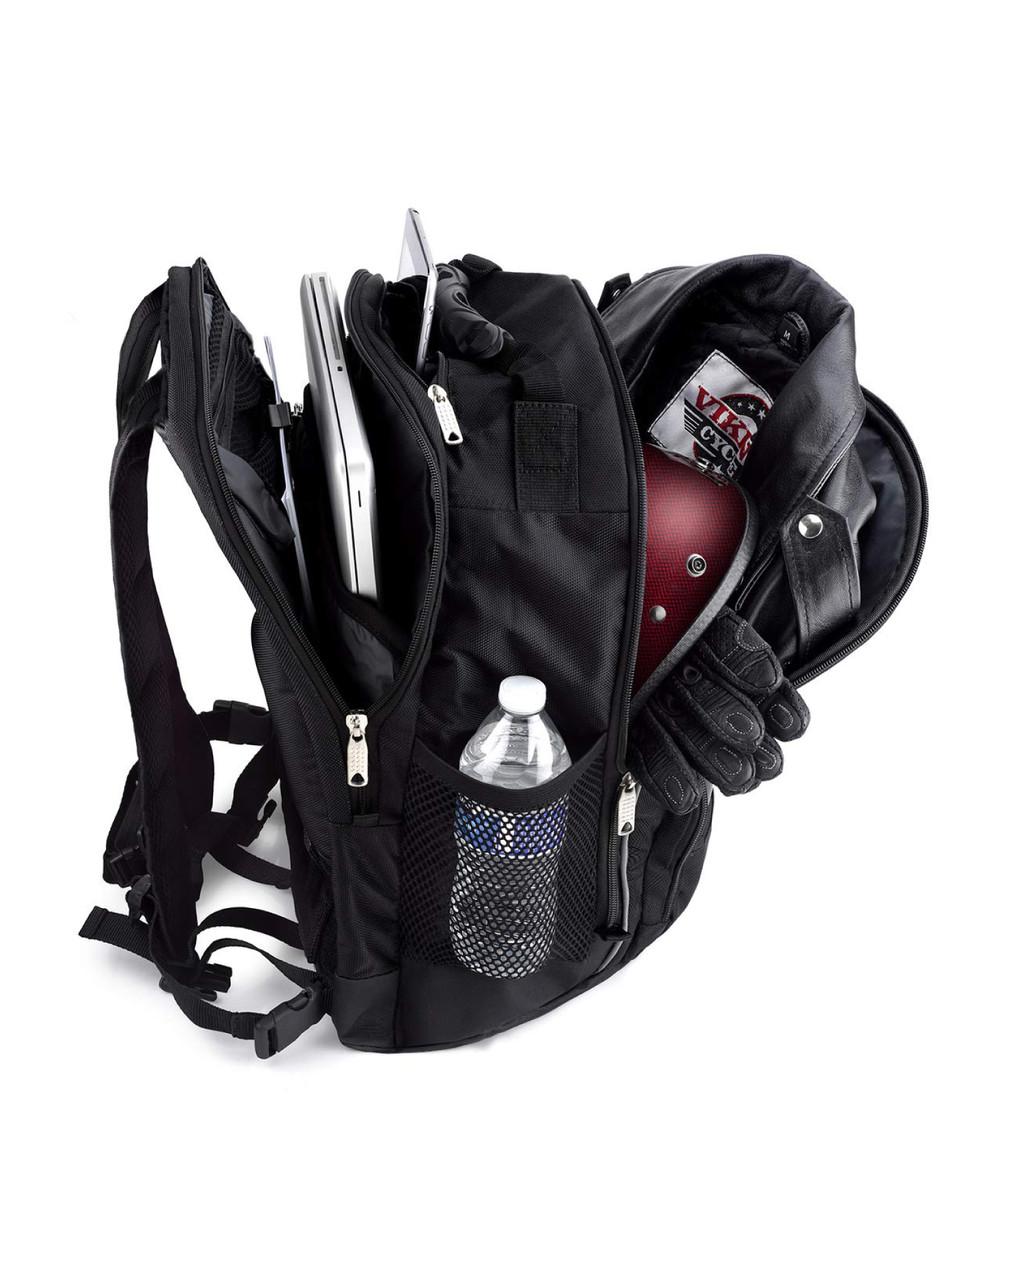 VikingBags Commuter Medium Motorcycle Sissy Bar Backpack